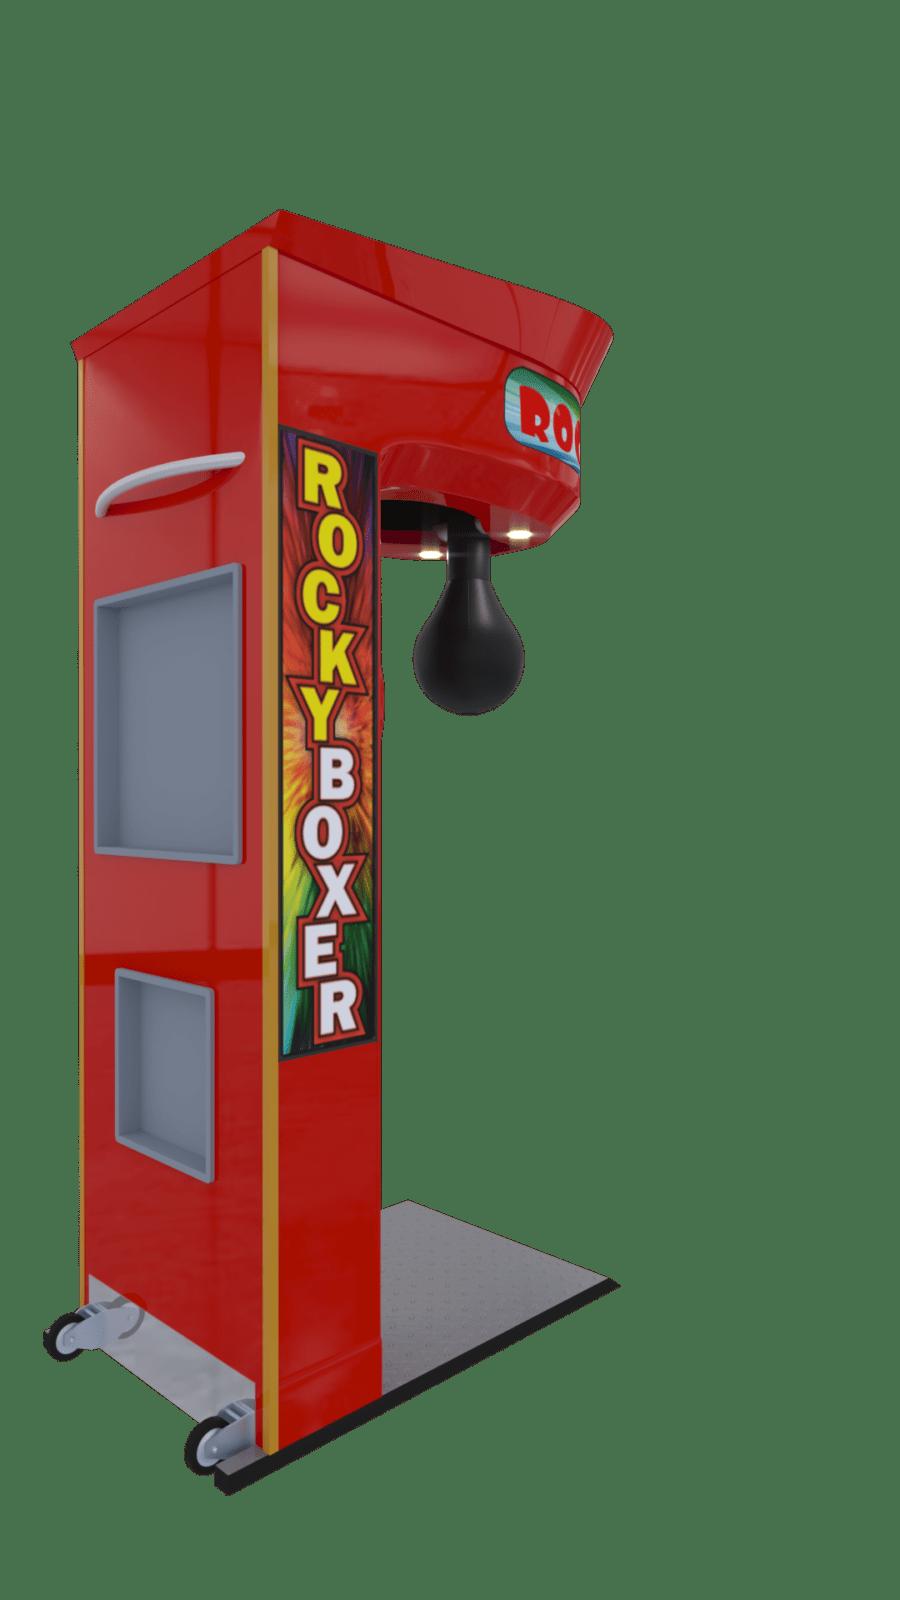 Rocky Boxer NEW